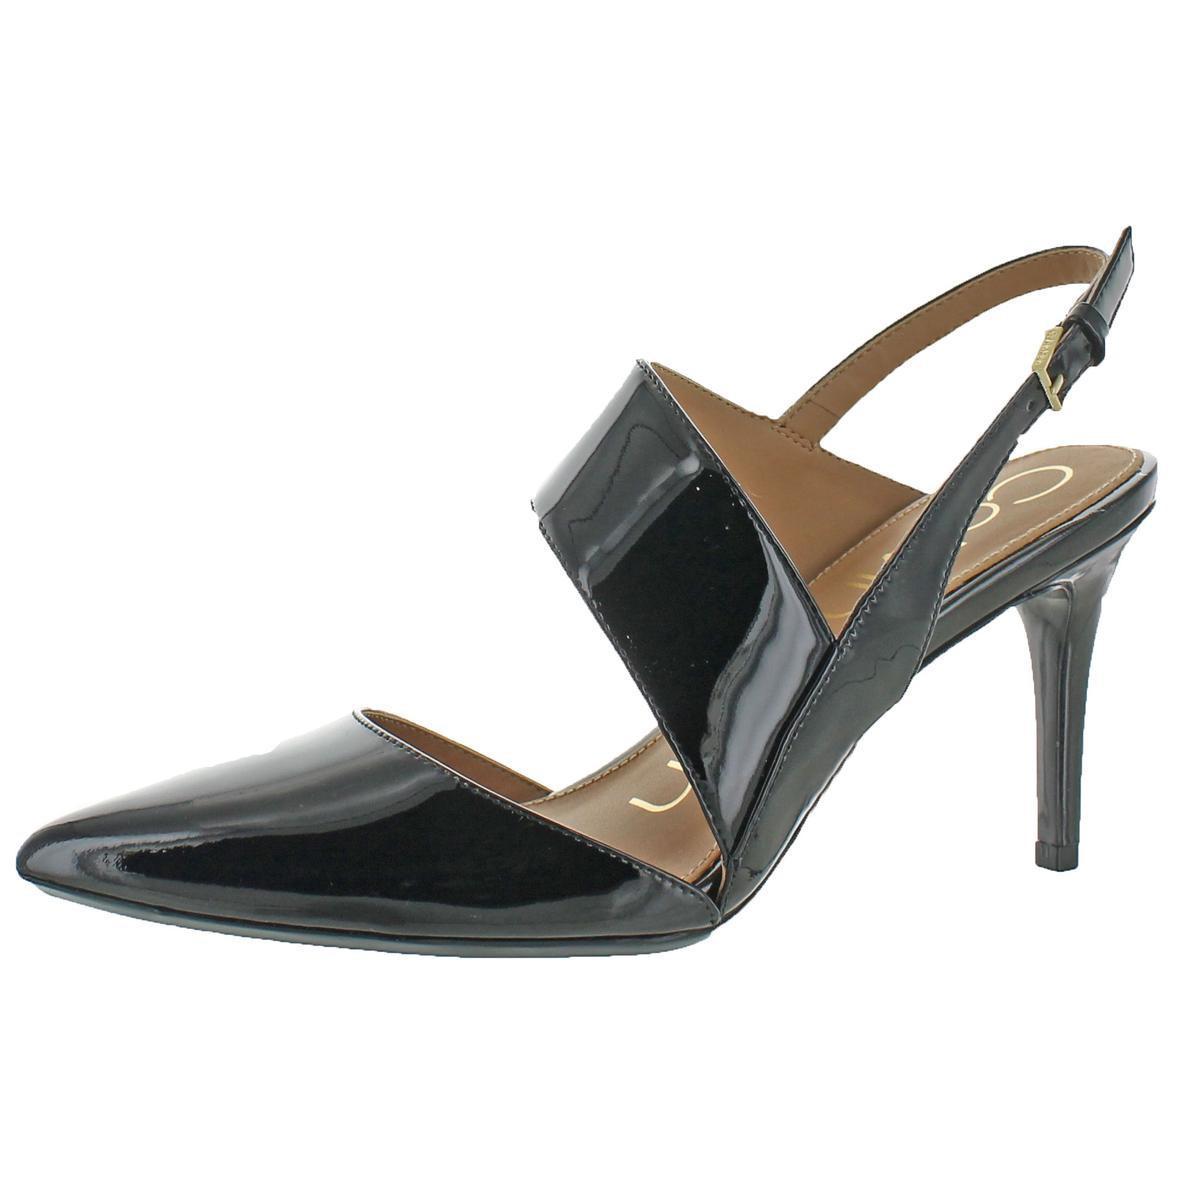 47eeeb72014 Lyst - Calvin Klein Gianna Leather Slingback Heeled Sandal Shoes in ...